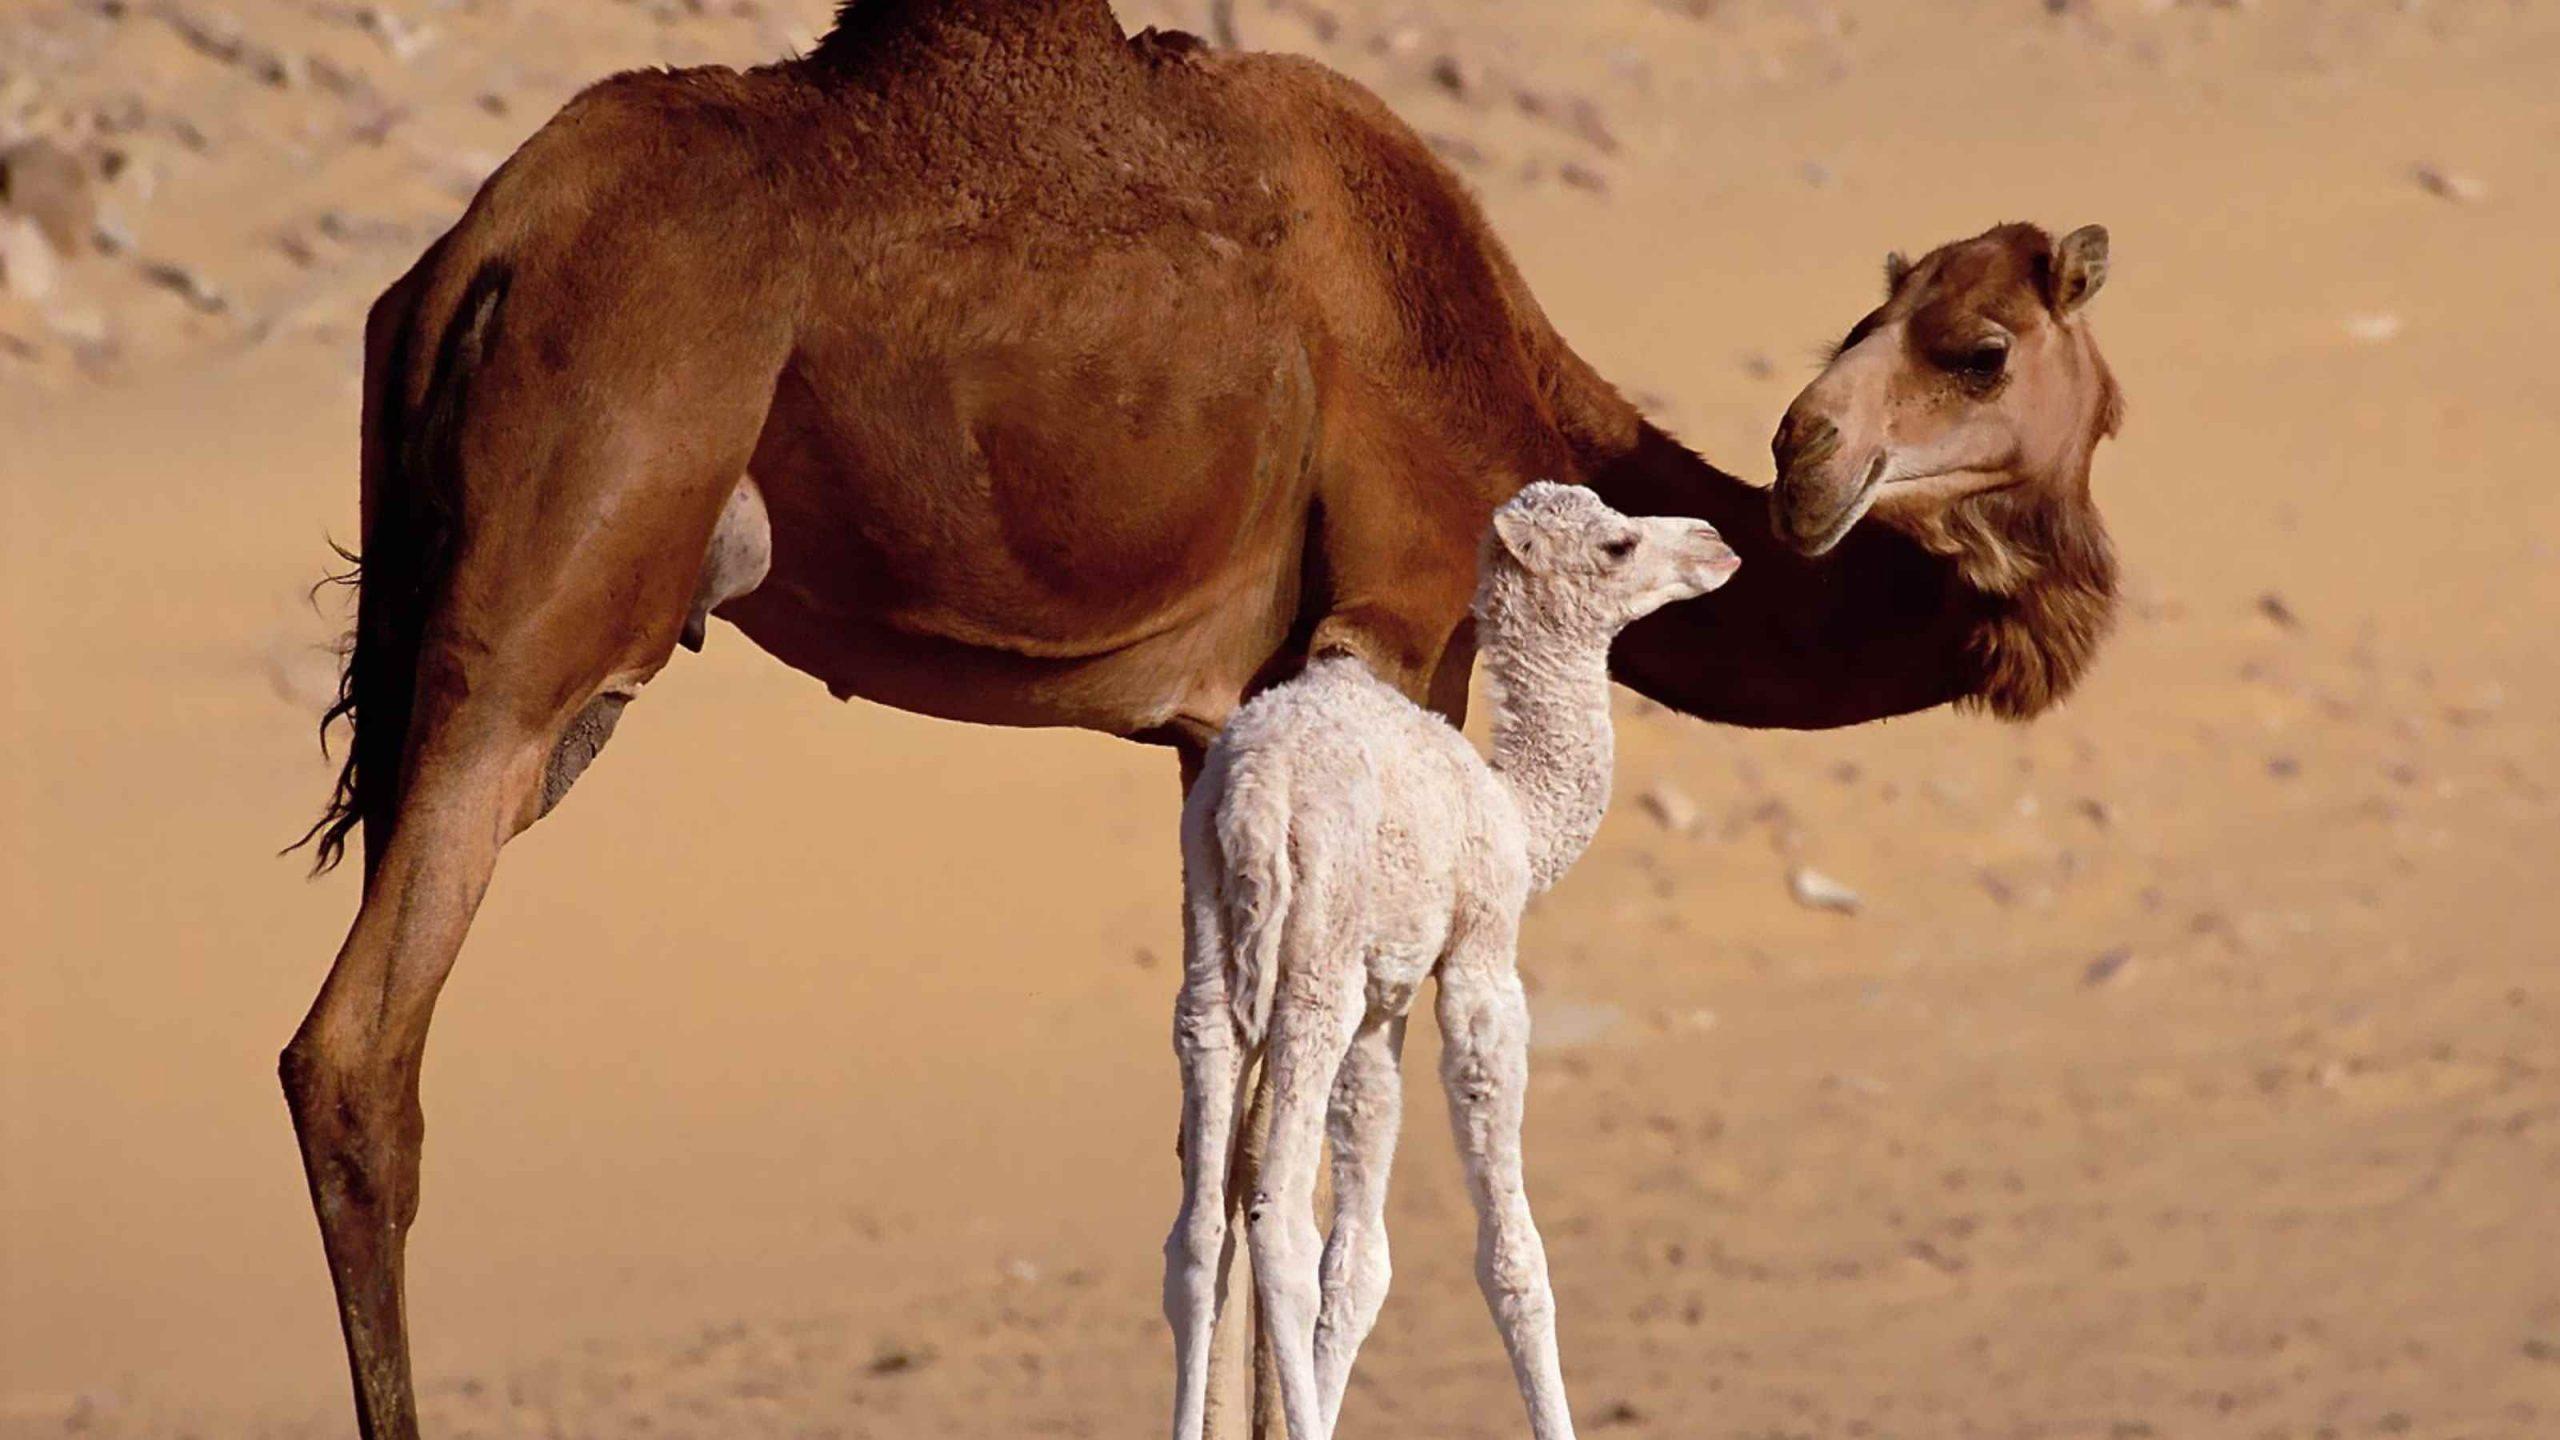 Красивый верблюд фото животного 10